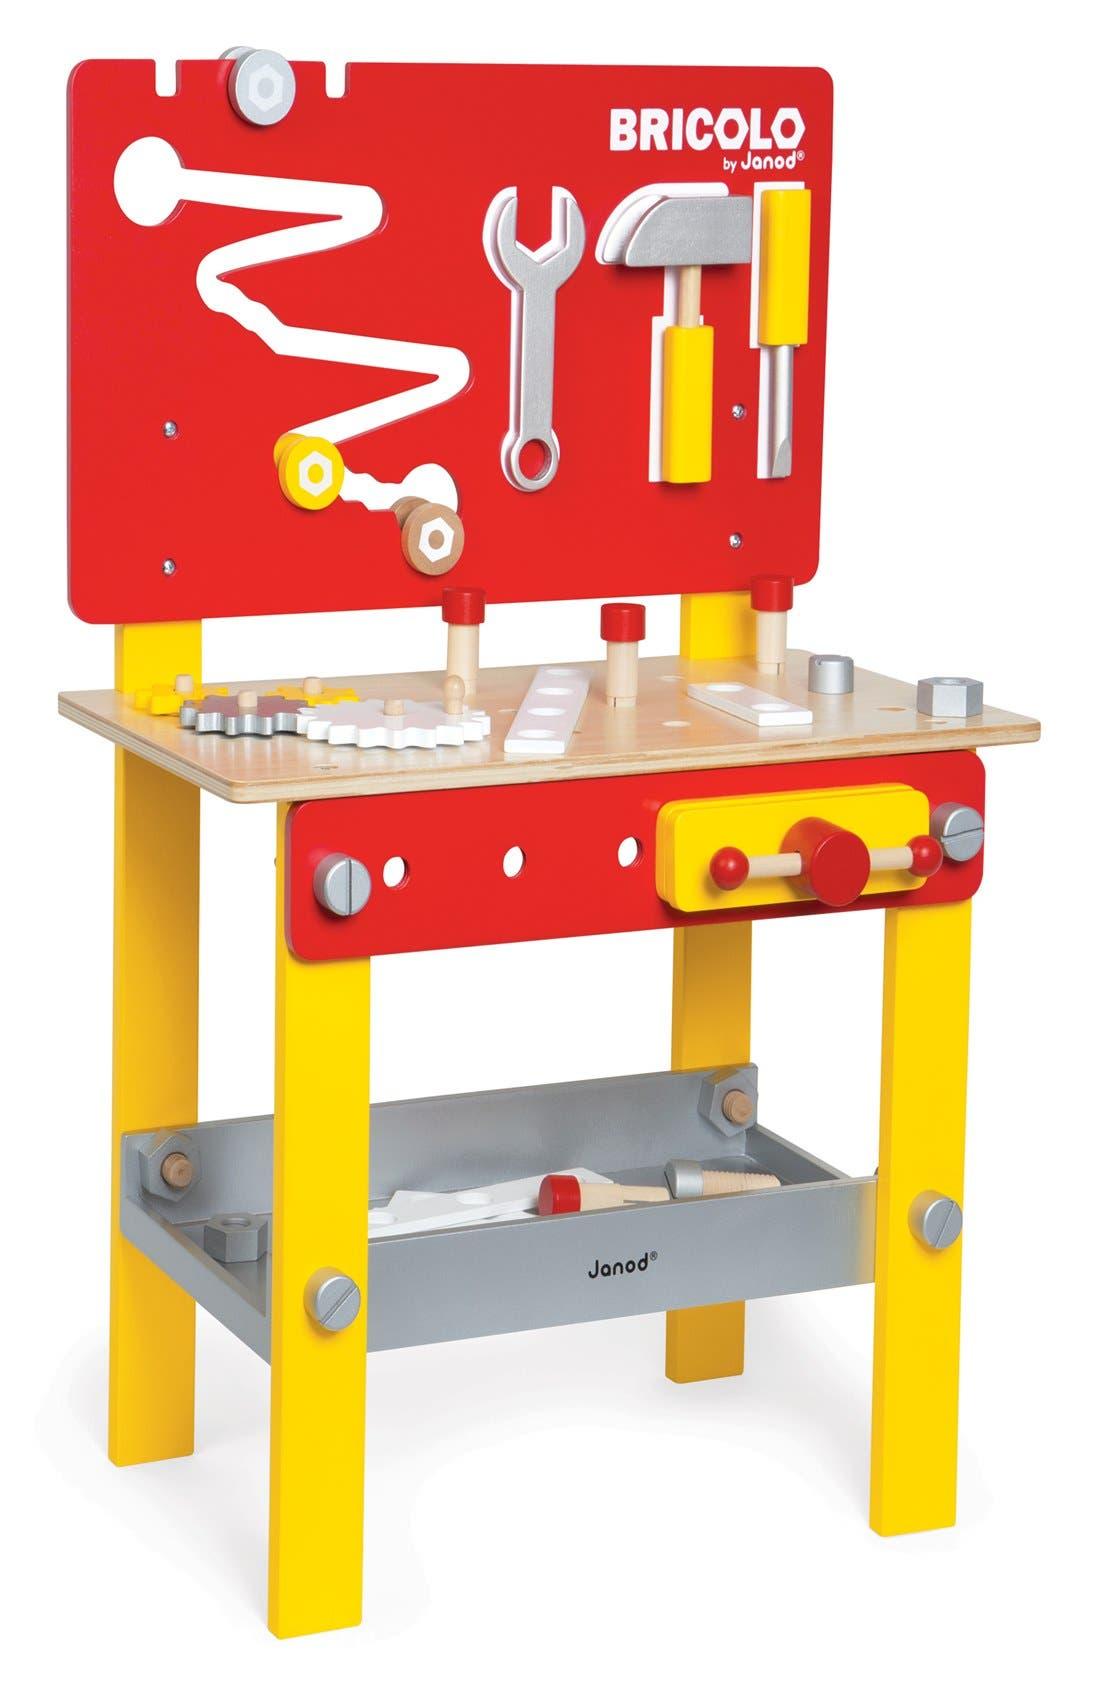 Janod 'Bricolo Redmaster - DIY Workbench' Play Set